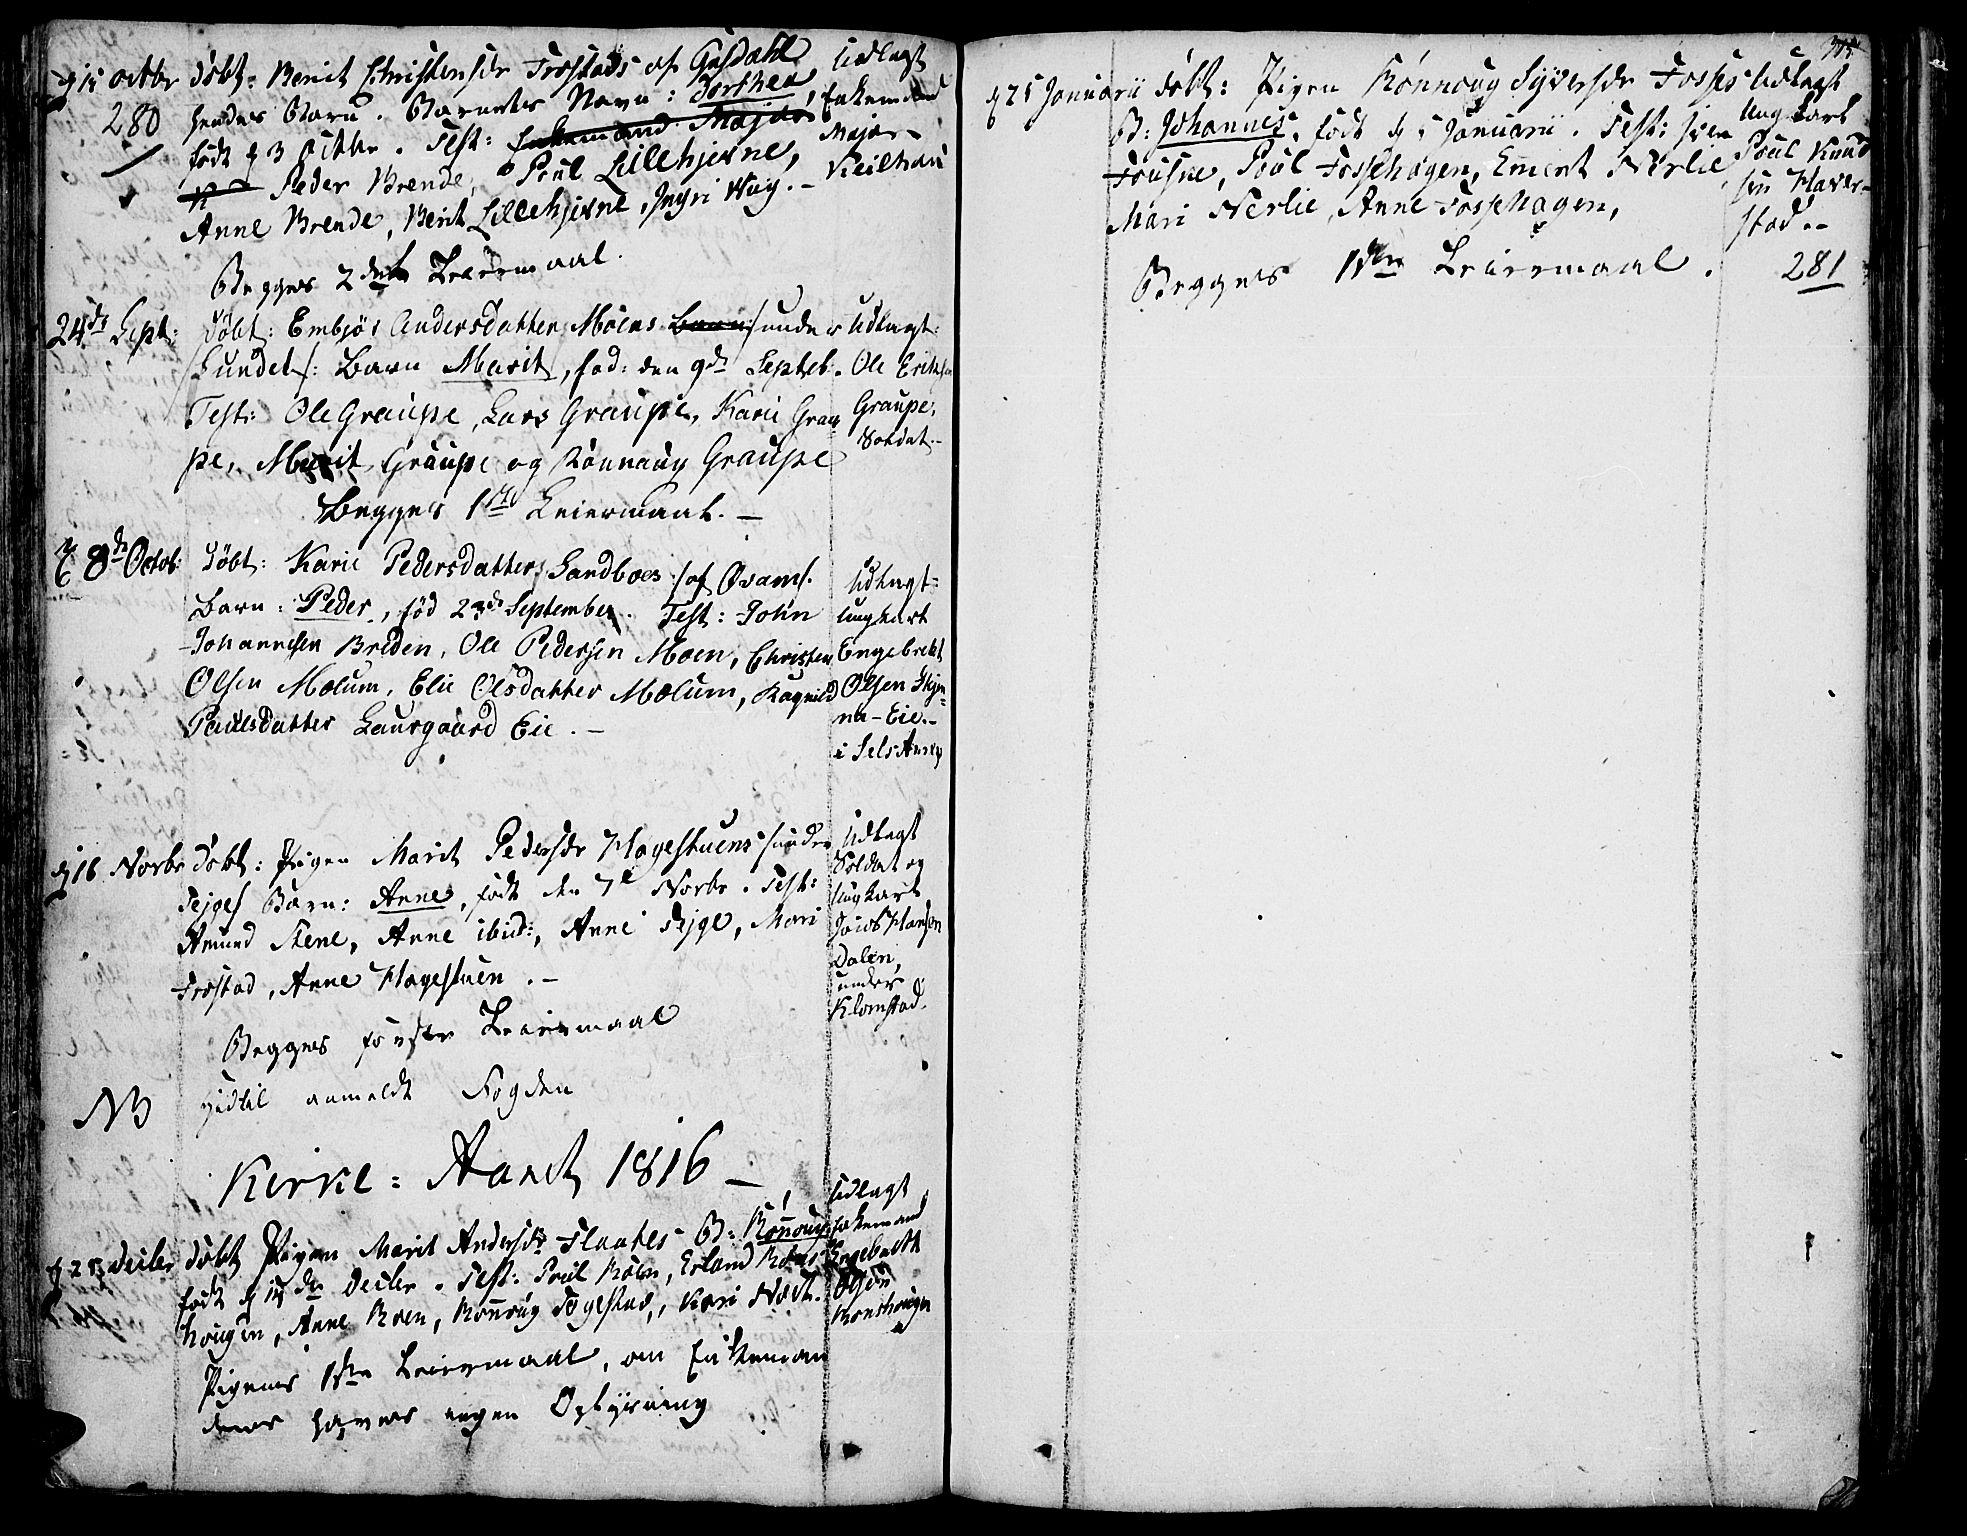 SAH, Fron prestekontor, H/Ha/Haa/L0001: Ministerialbok nr. 1, 1799-1816, s. 280-281